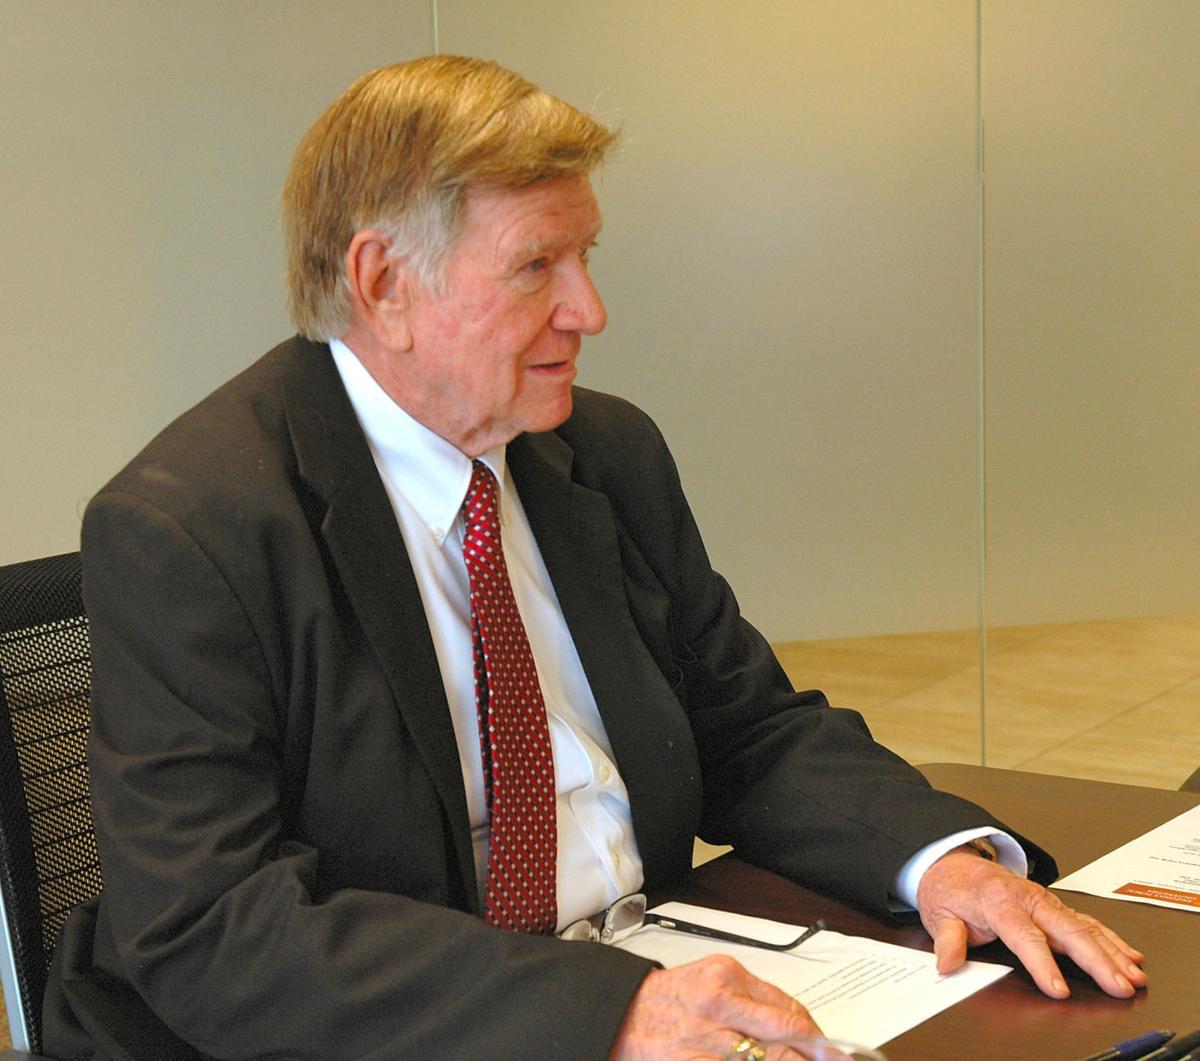 Regents Chairman Bill Ridenour